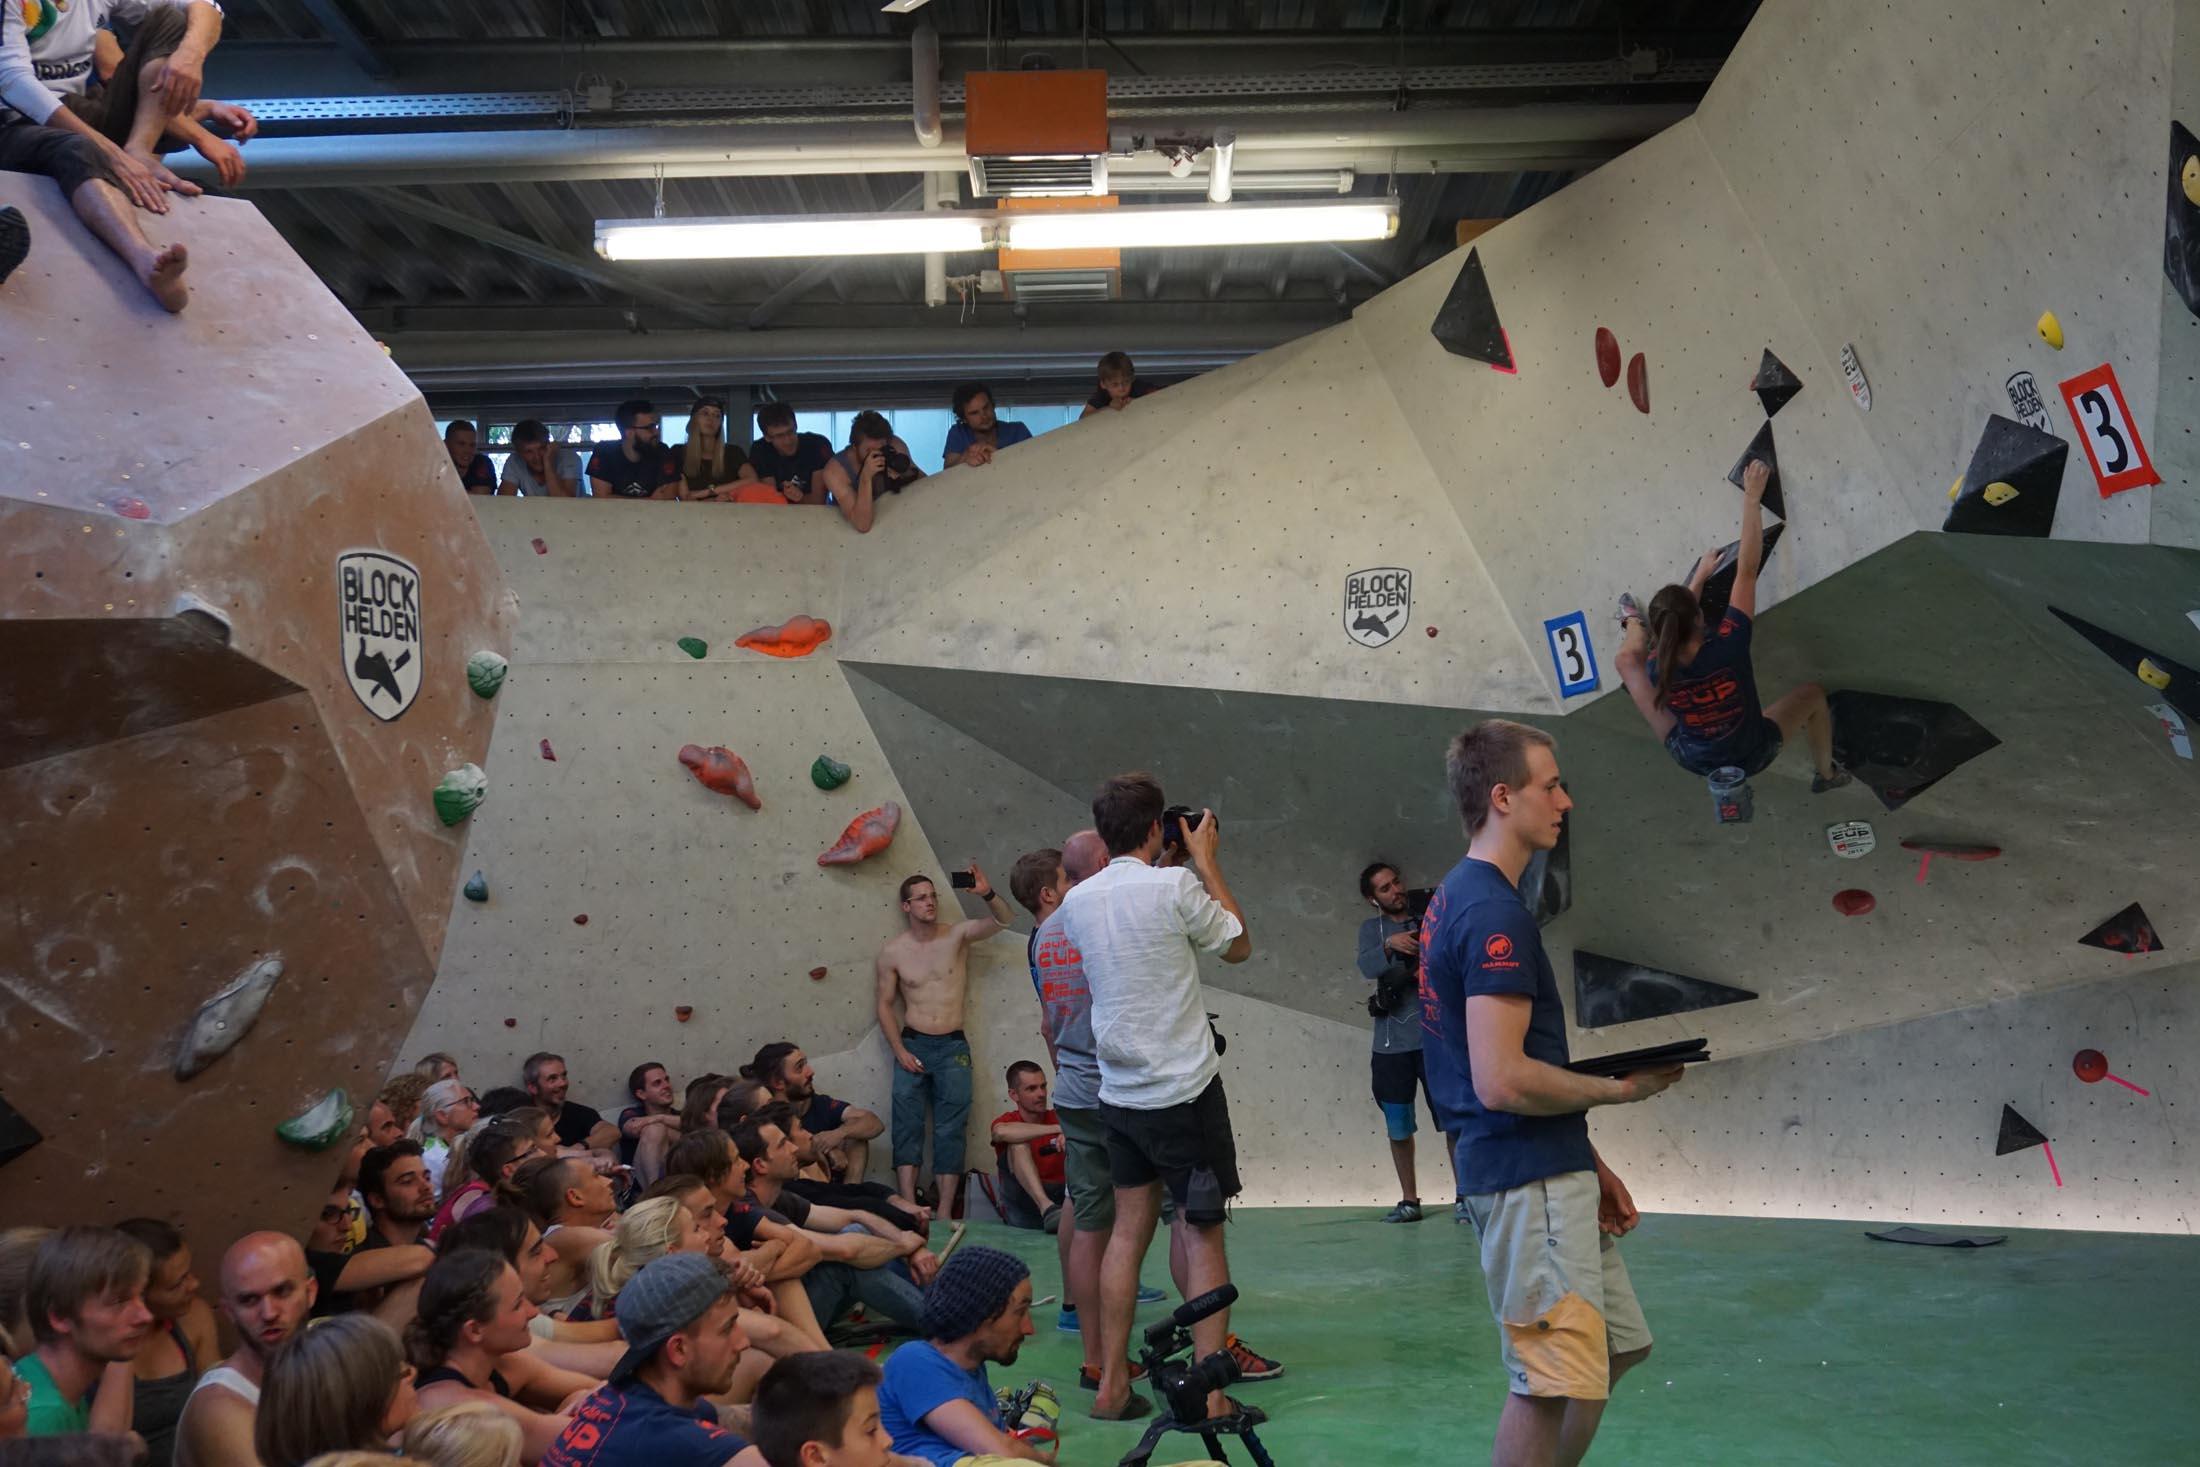 Finale, internationaler bouldercup Frankenjura 2016, BLOCKHELDEN Erlangen, Mammut, Bergfreunde.de, Boulderwettkampf07092016686